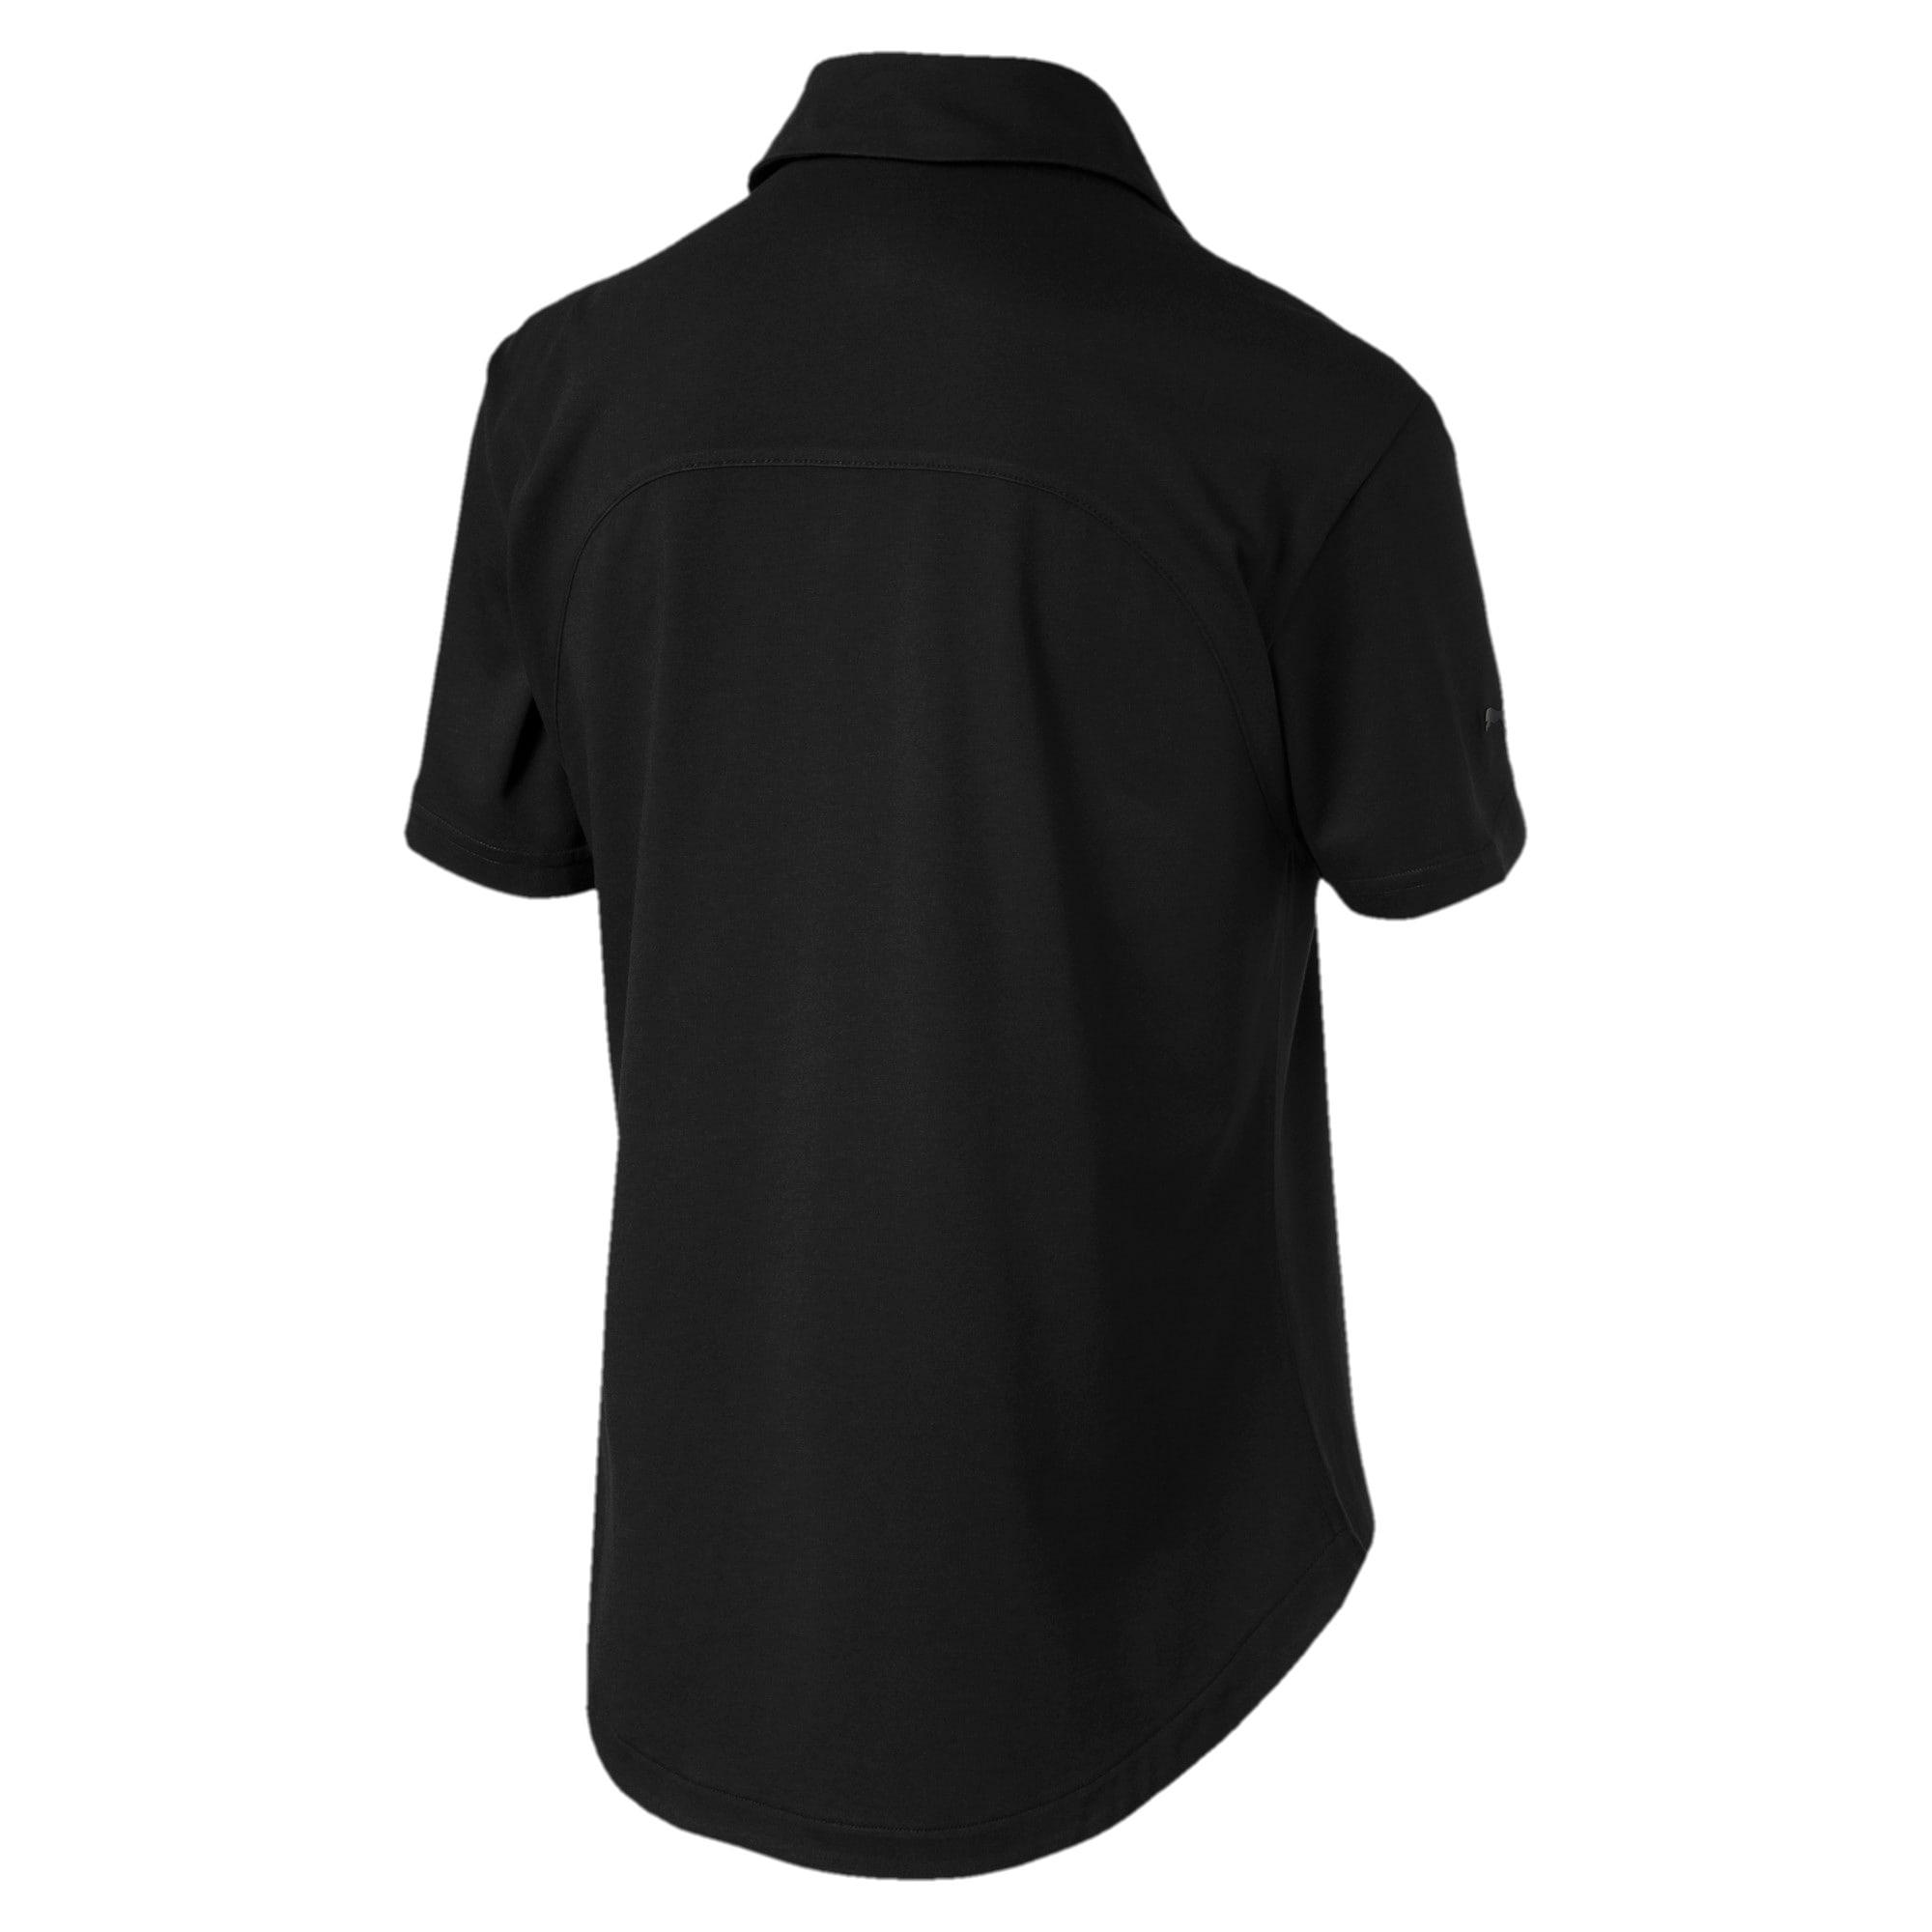 Miniatura 5 de Camiseta tipo polo Scuderia Ferrari para mujer, Puma Black, mediano